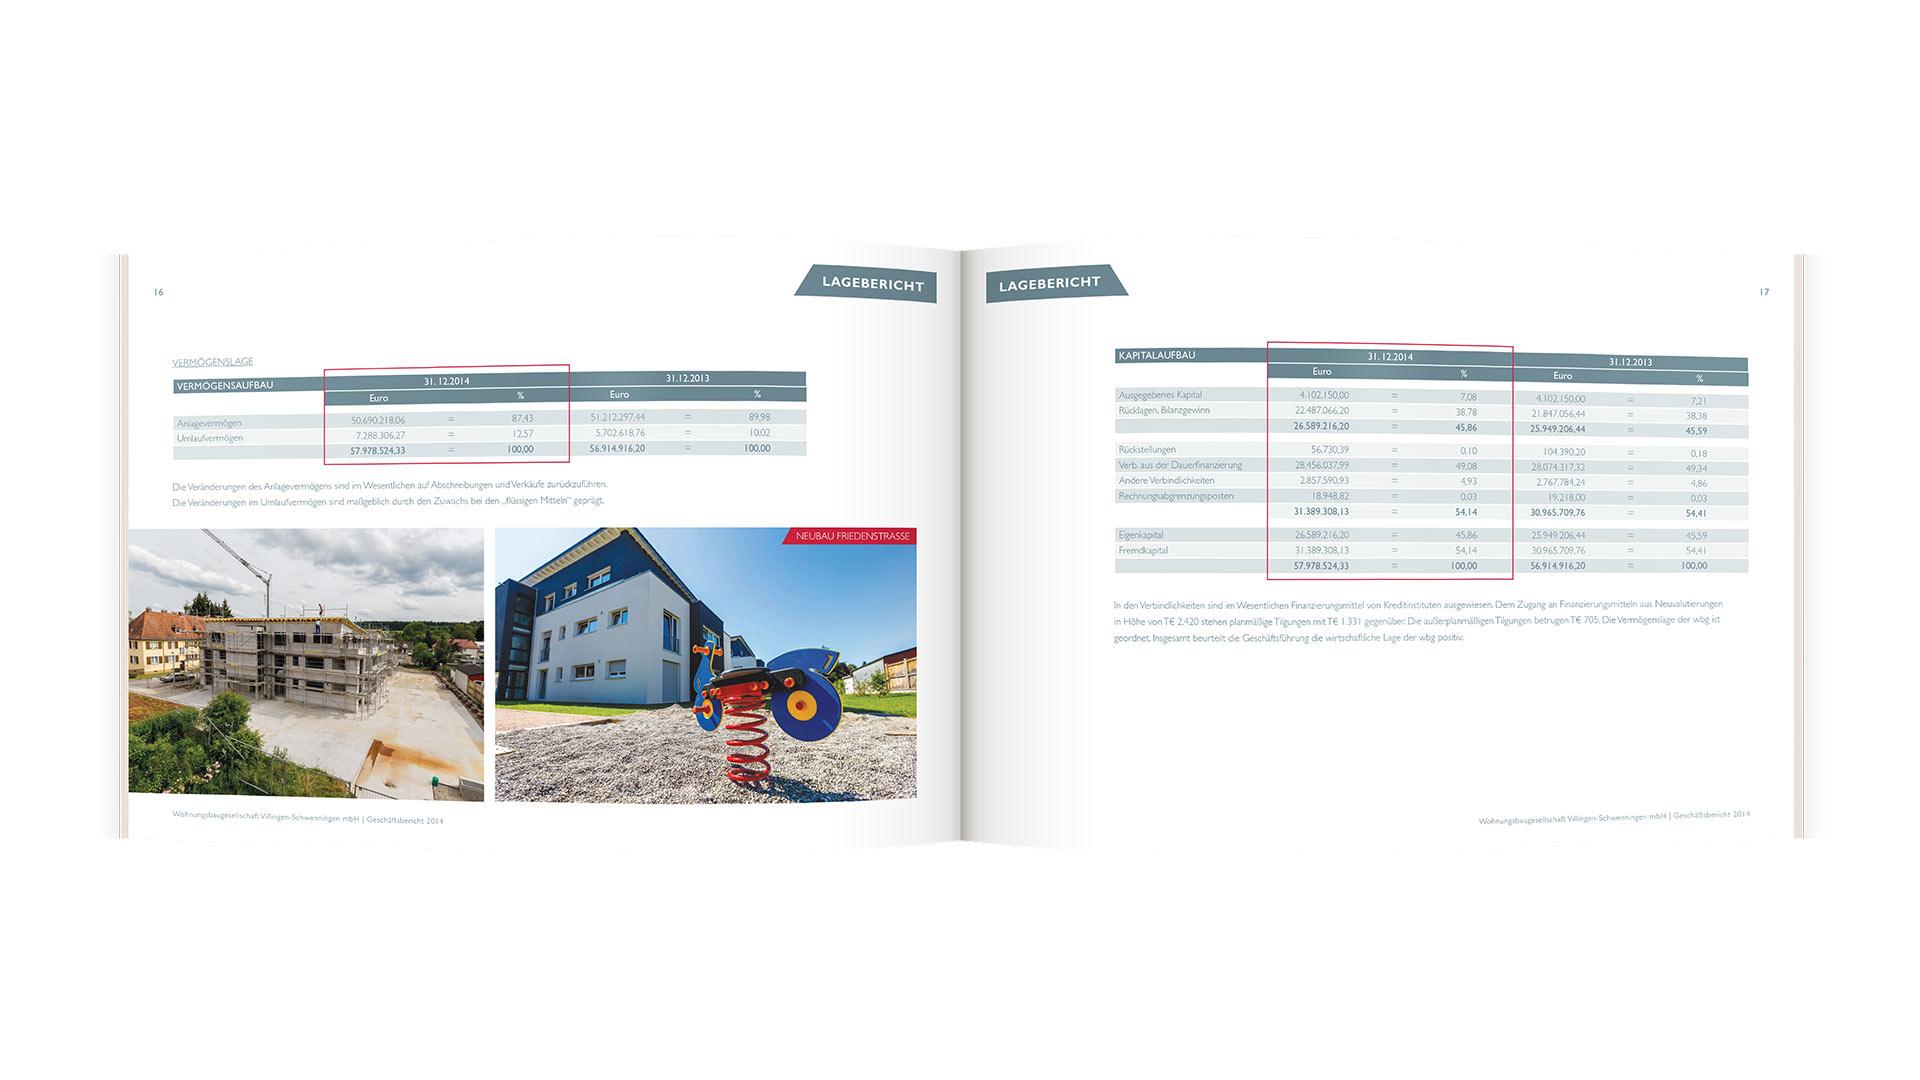 wbg Geschäftsbericht 2014